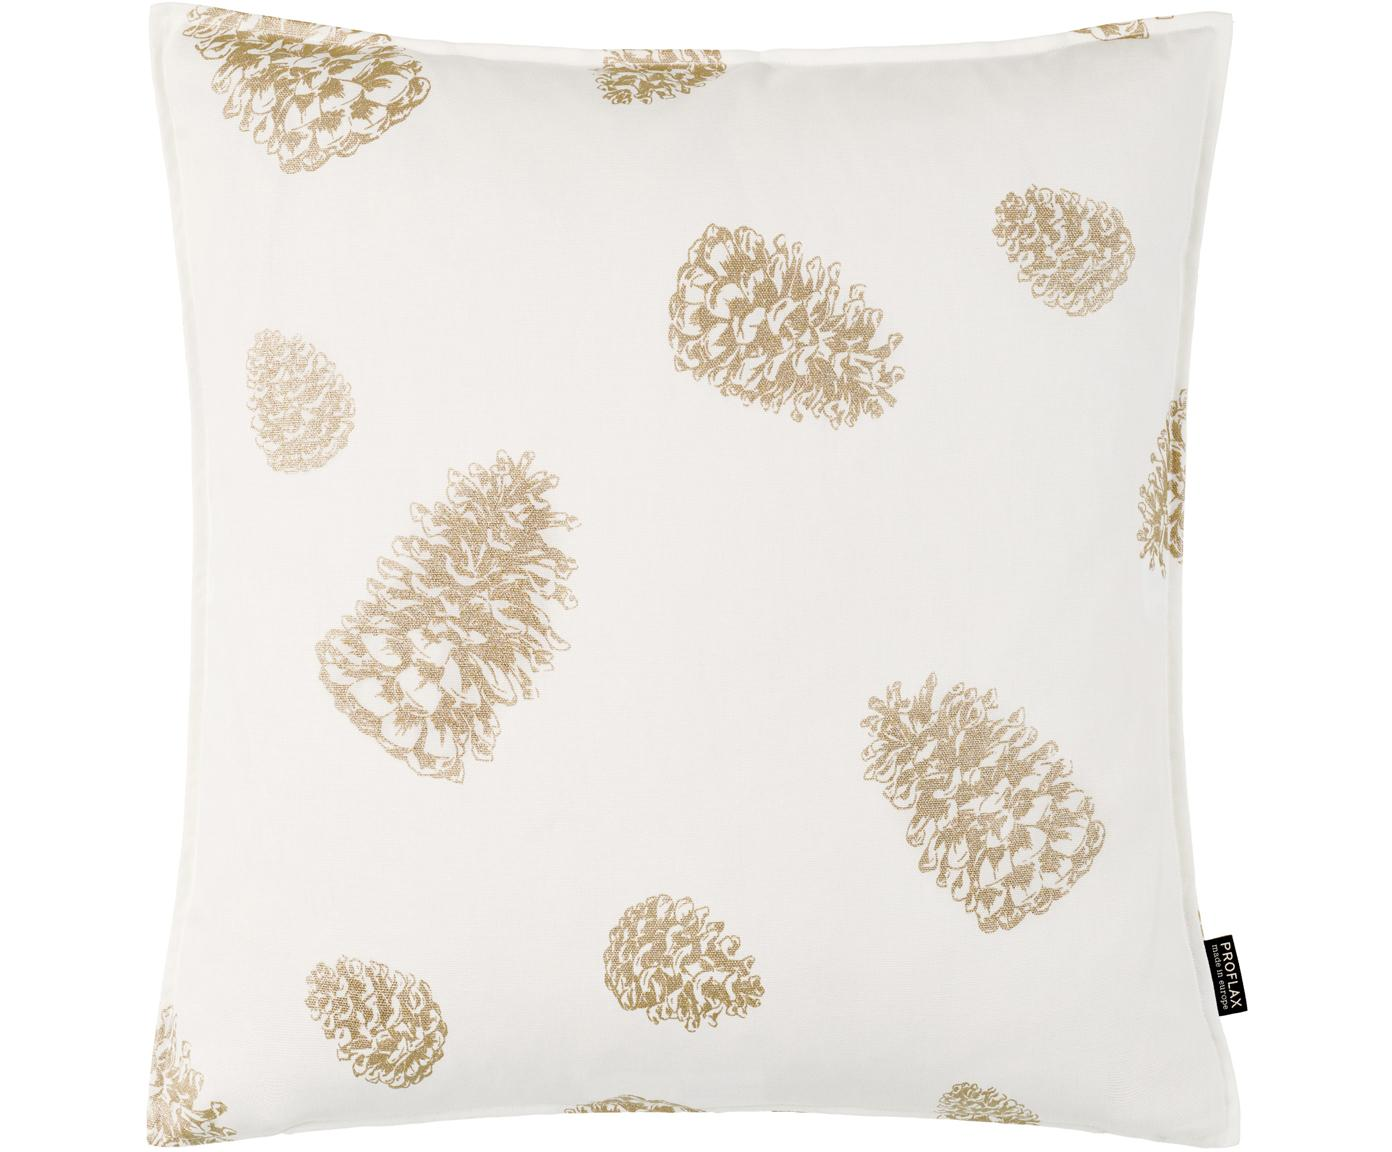 Kissenhülle Edvin, Baumwolle, Weiß, Hellbeige, Goldfarben, 40 x 40 cm